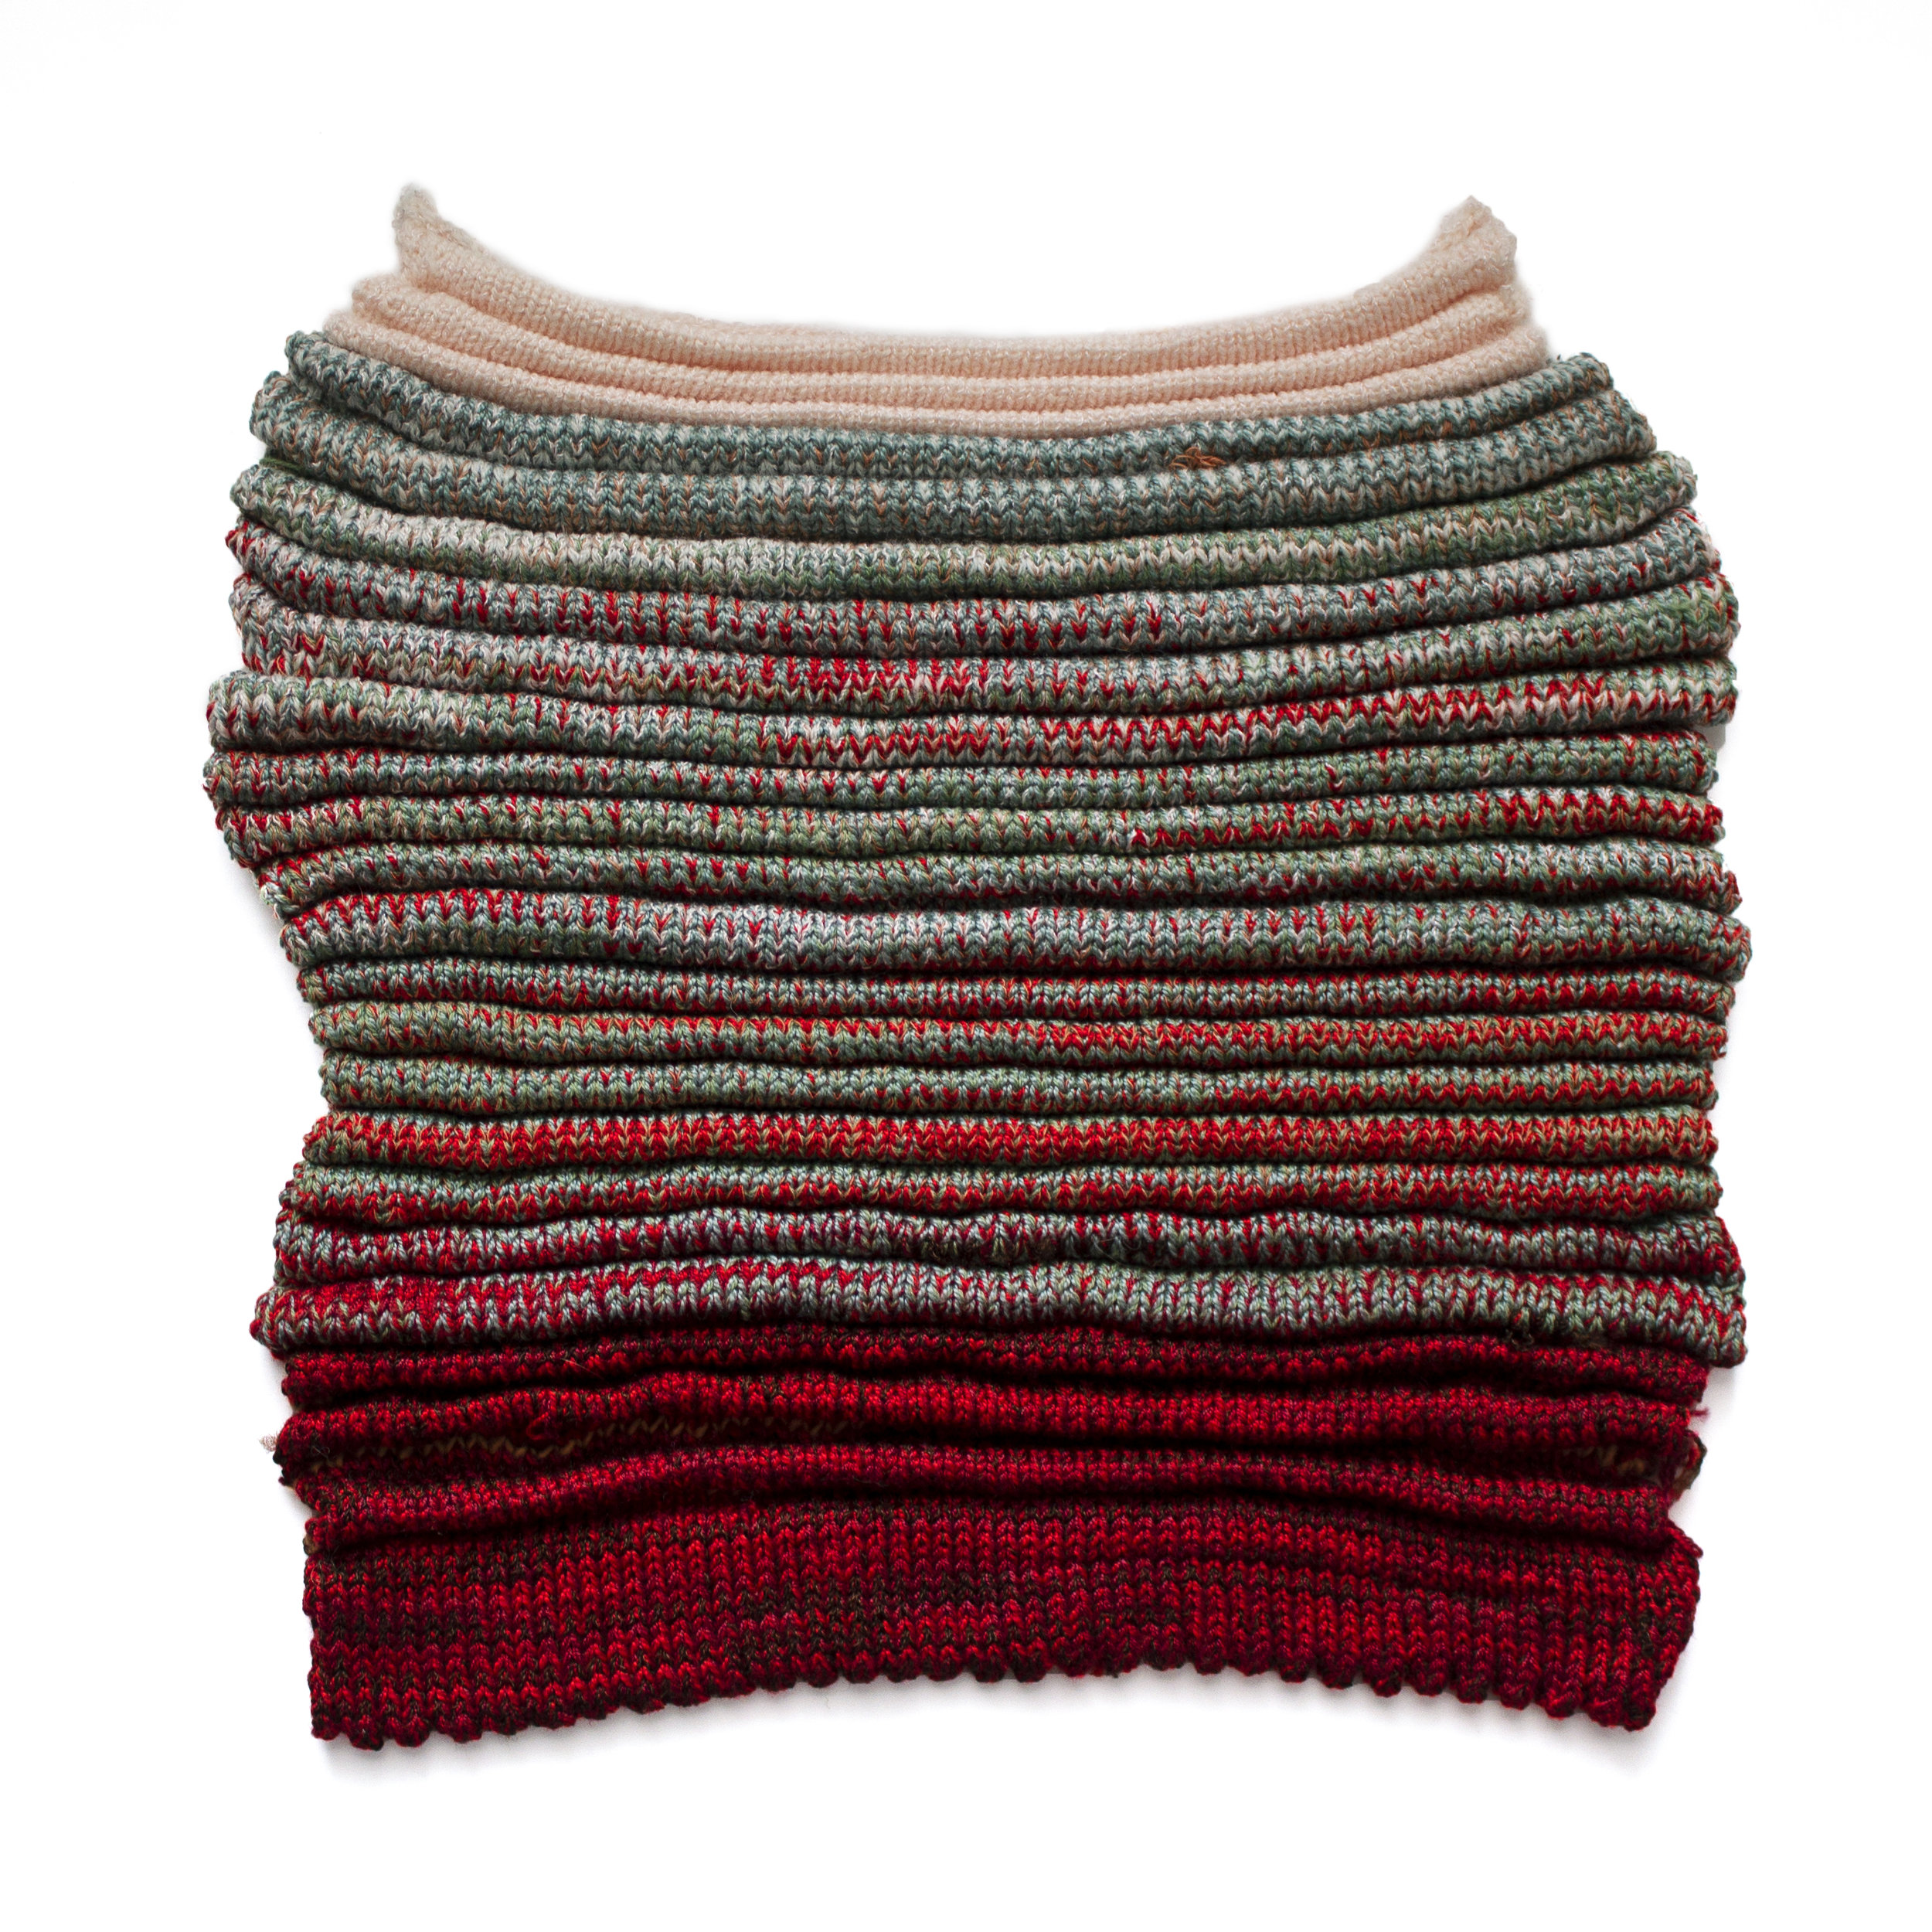 eyesweater2.jpg